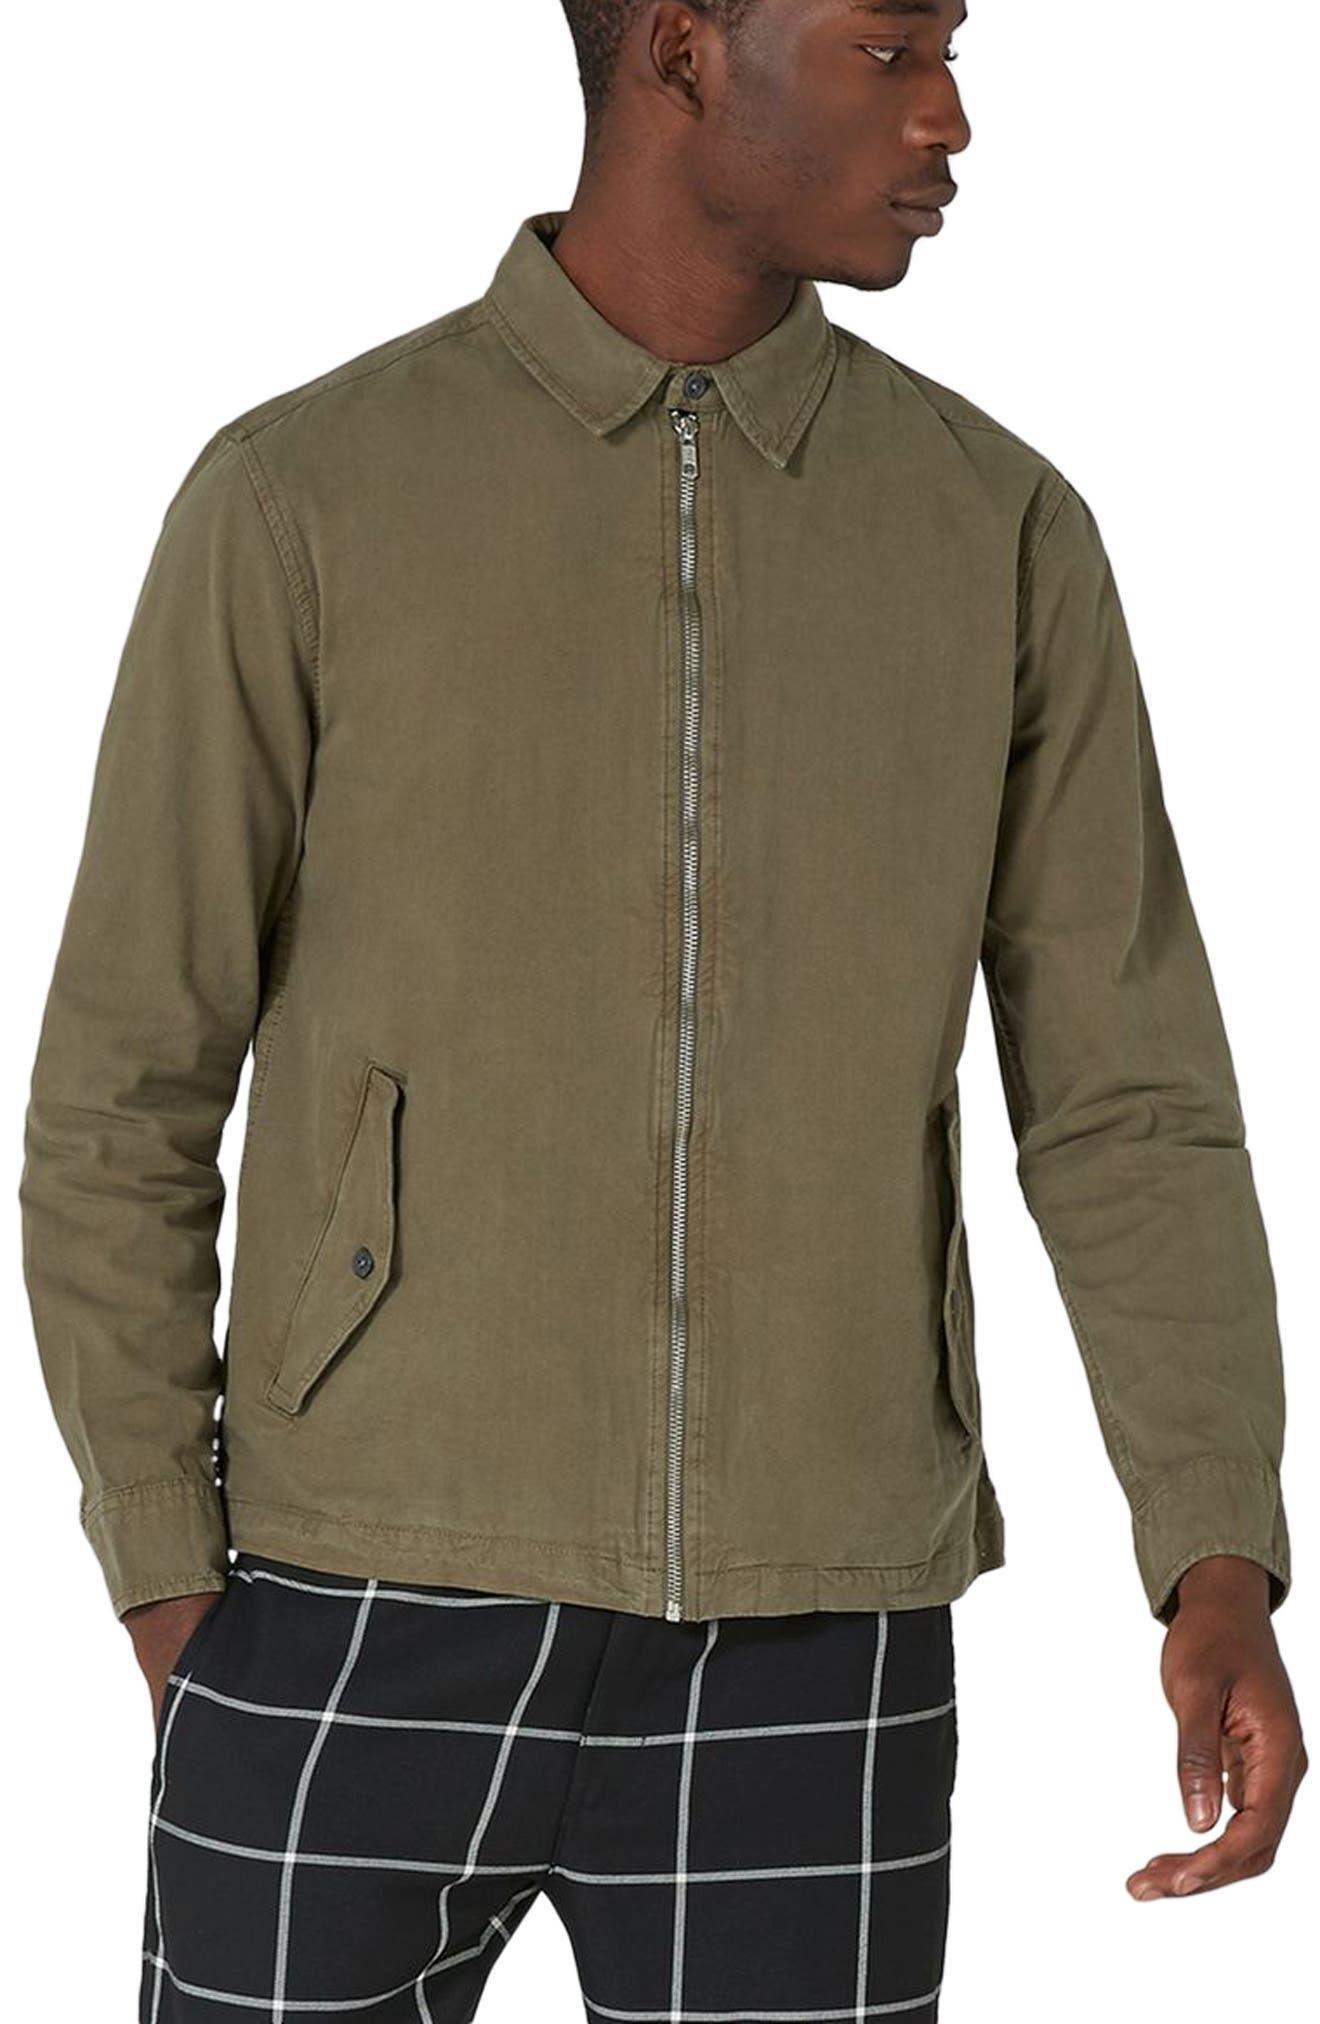 Alternate Image 1 Selected - Topman Zip Front Shirt Jacket